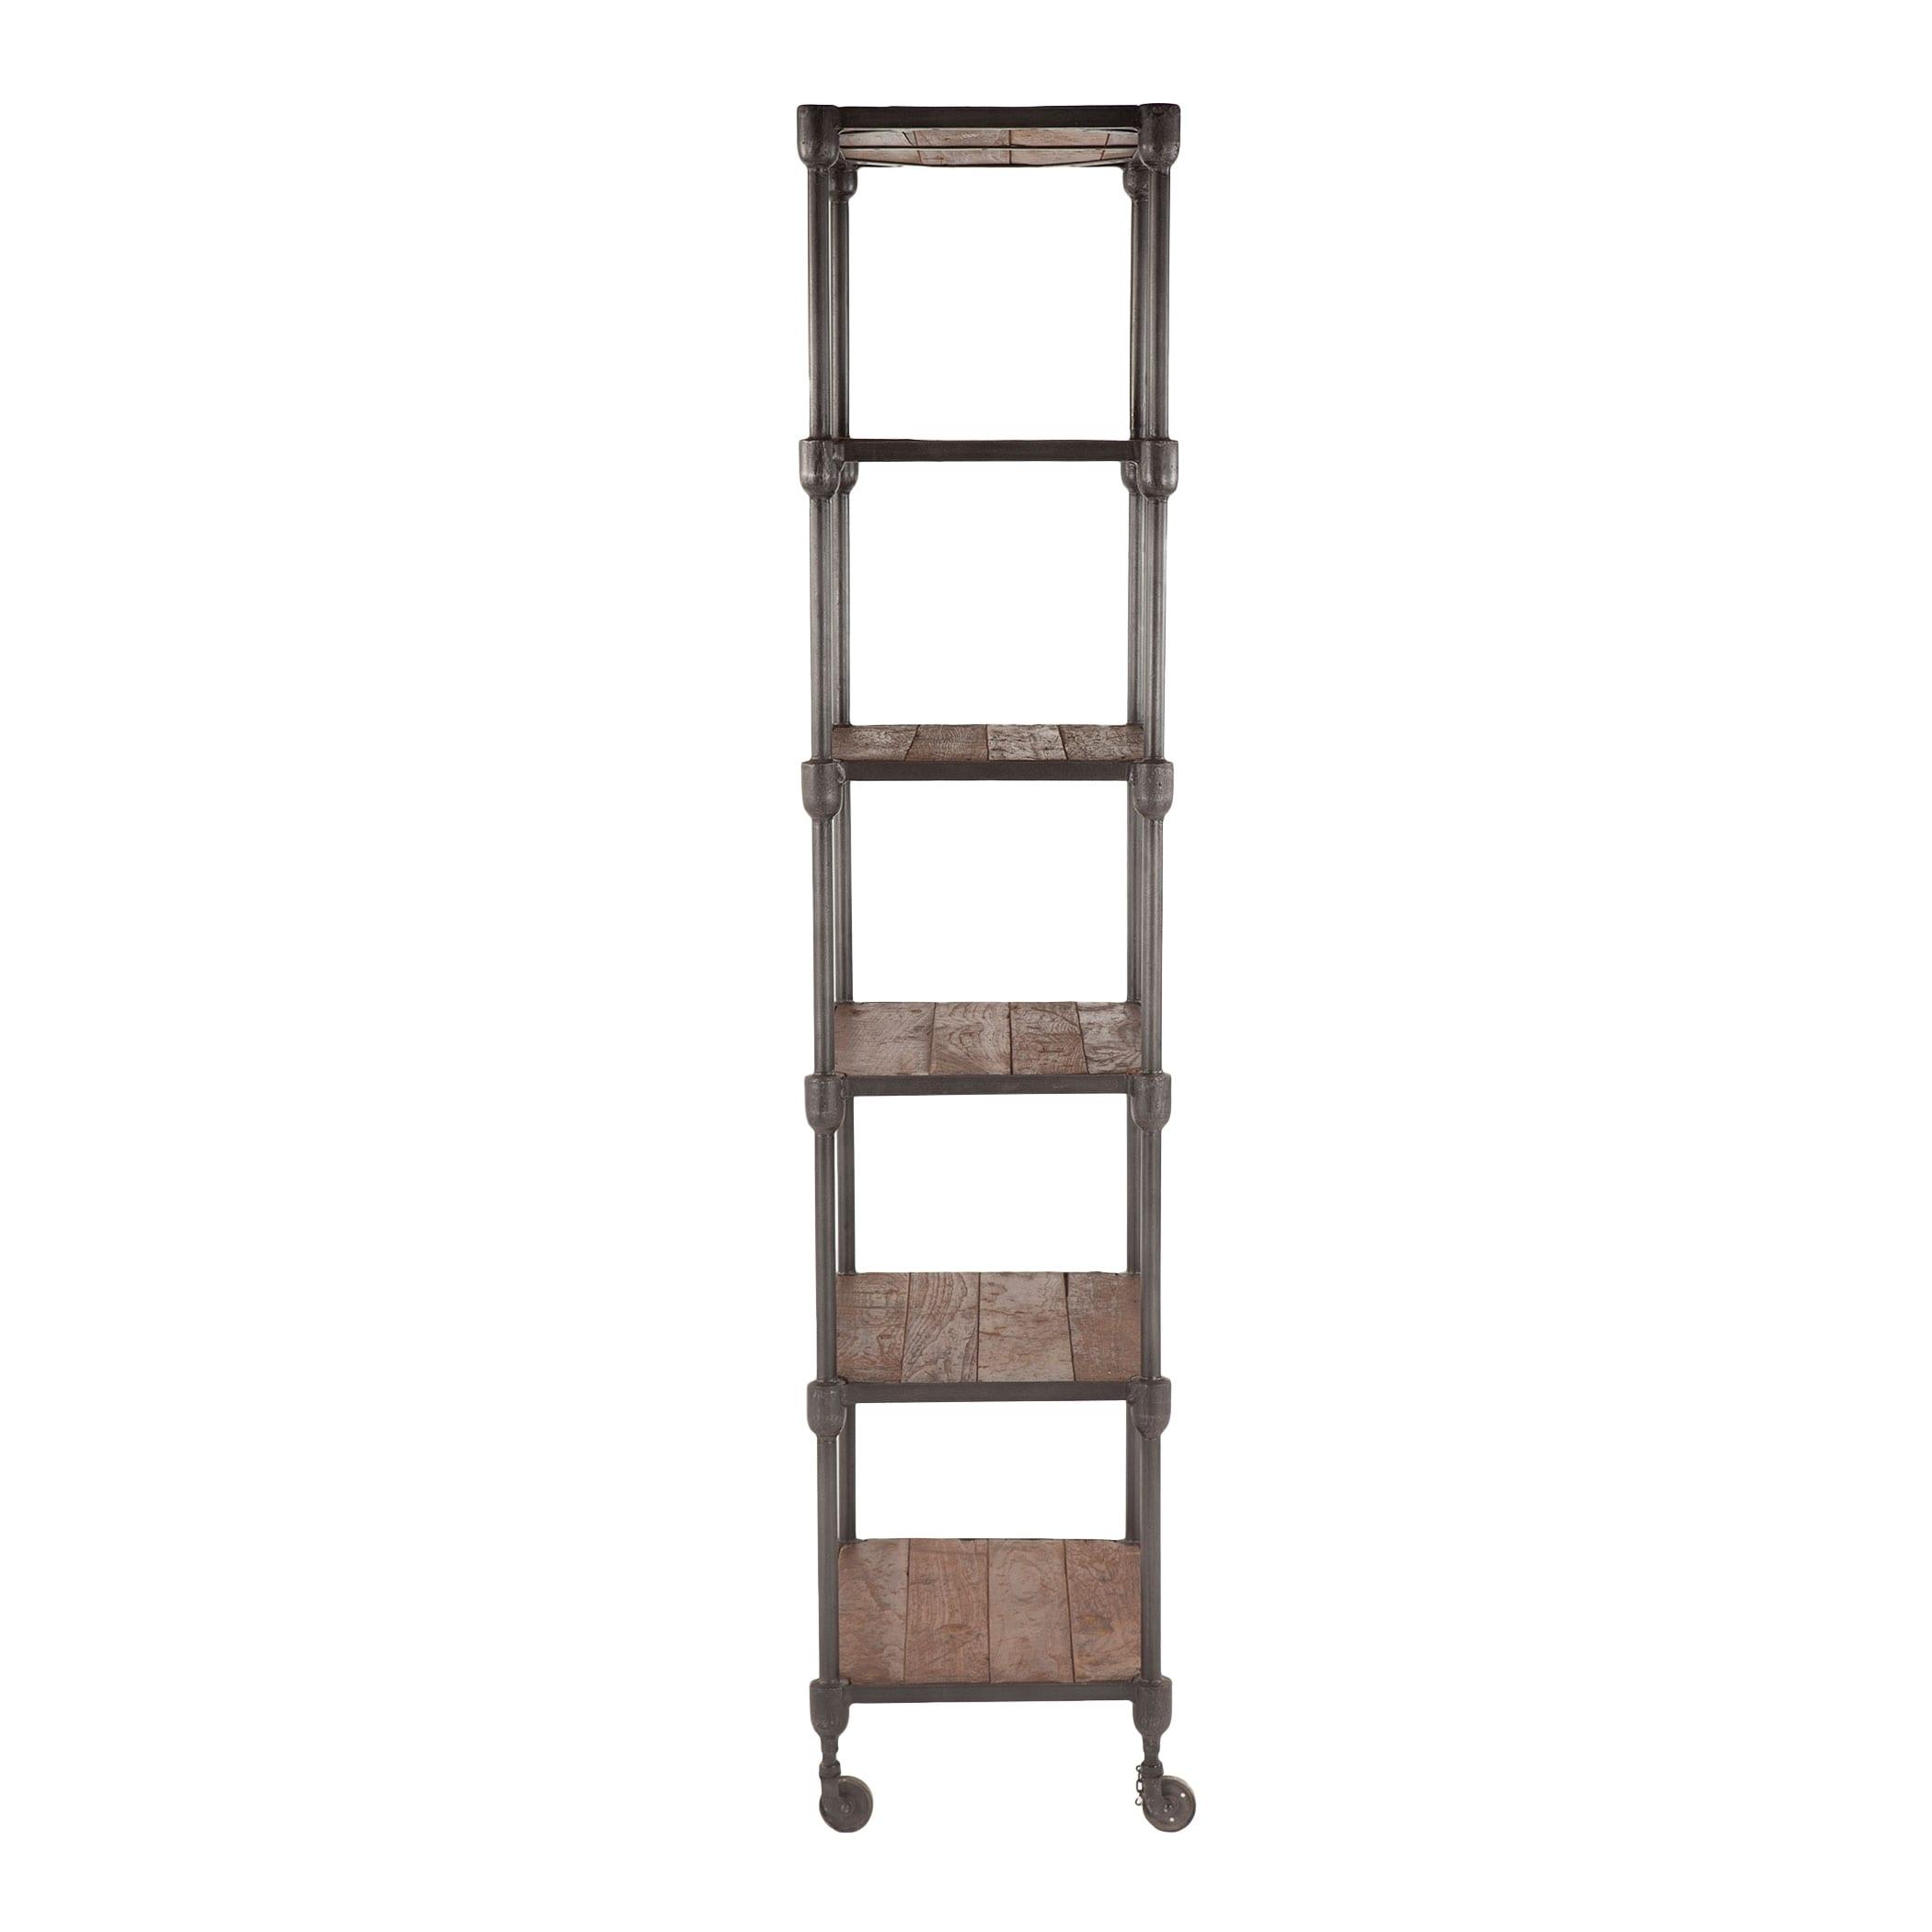 Paxton 25-Inch Wide Industrial Bookshelf - Overstock - 26970403